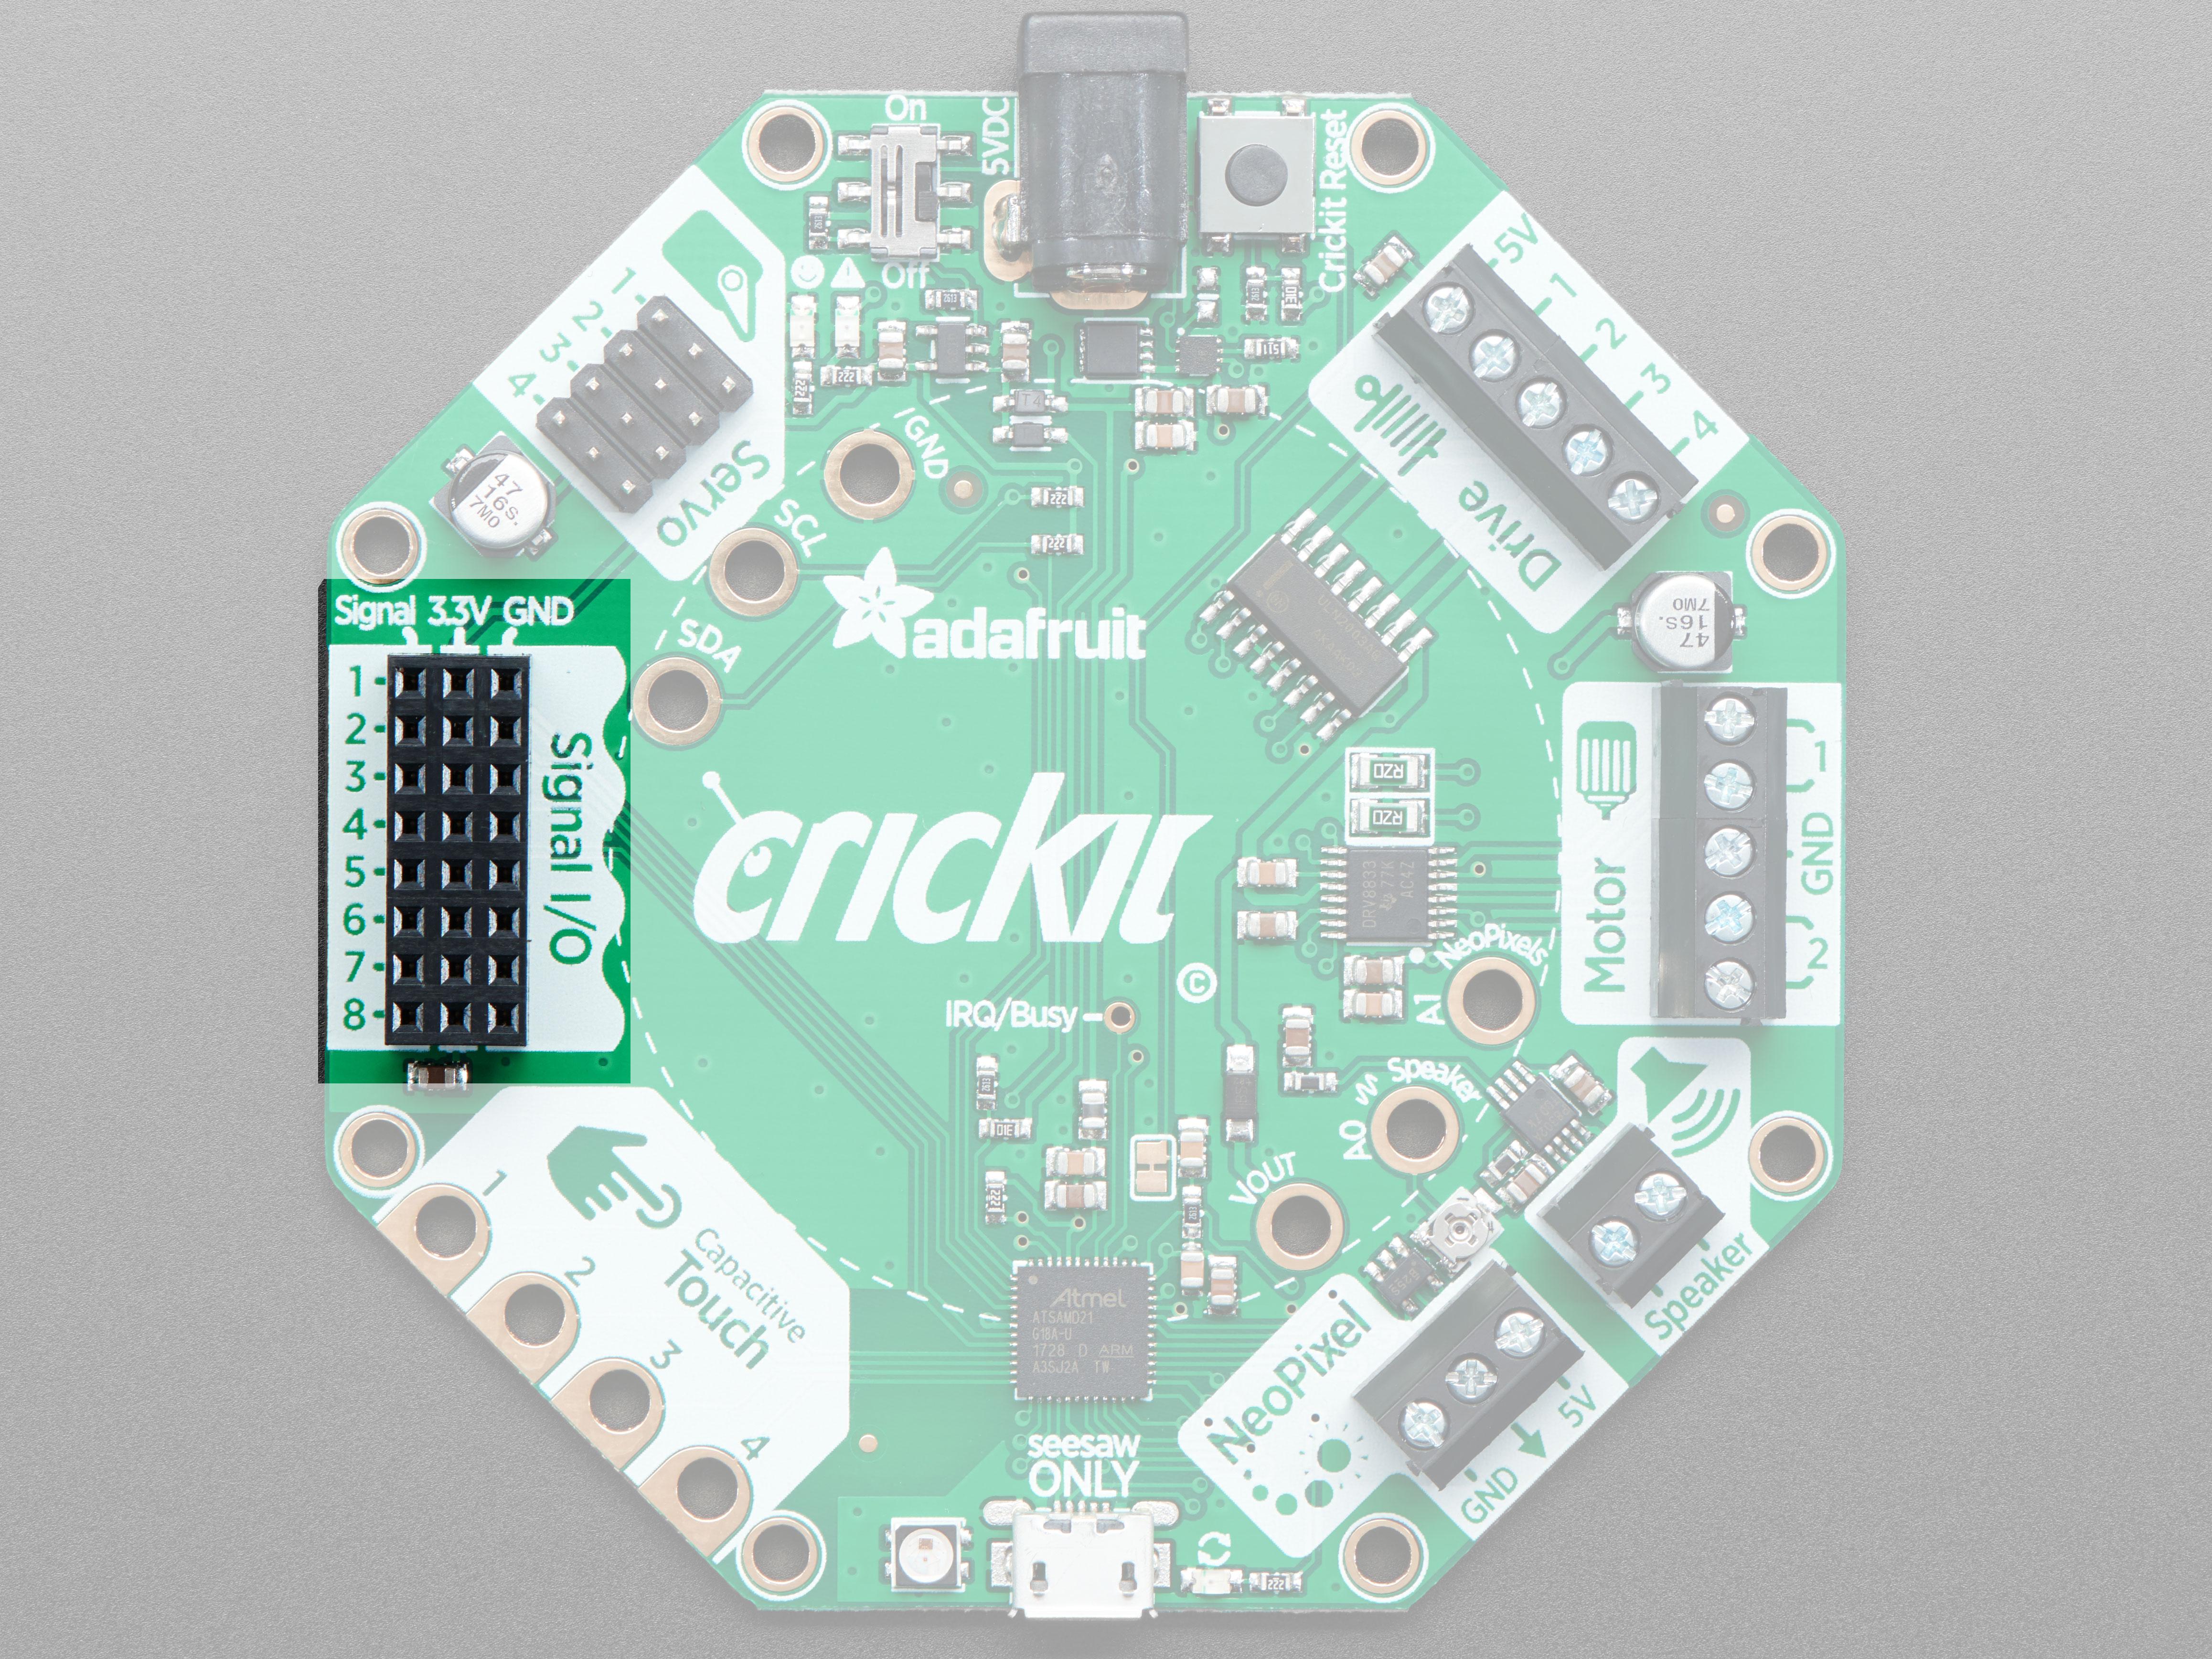 circuit_playground_signal.jpg